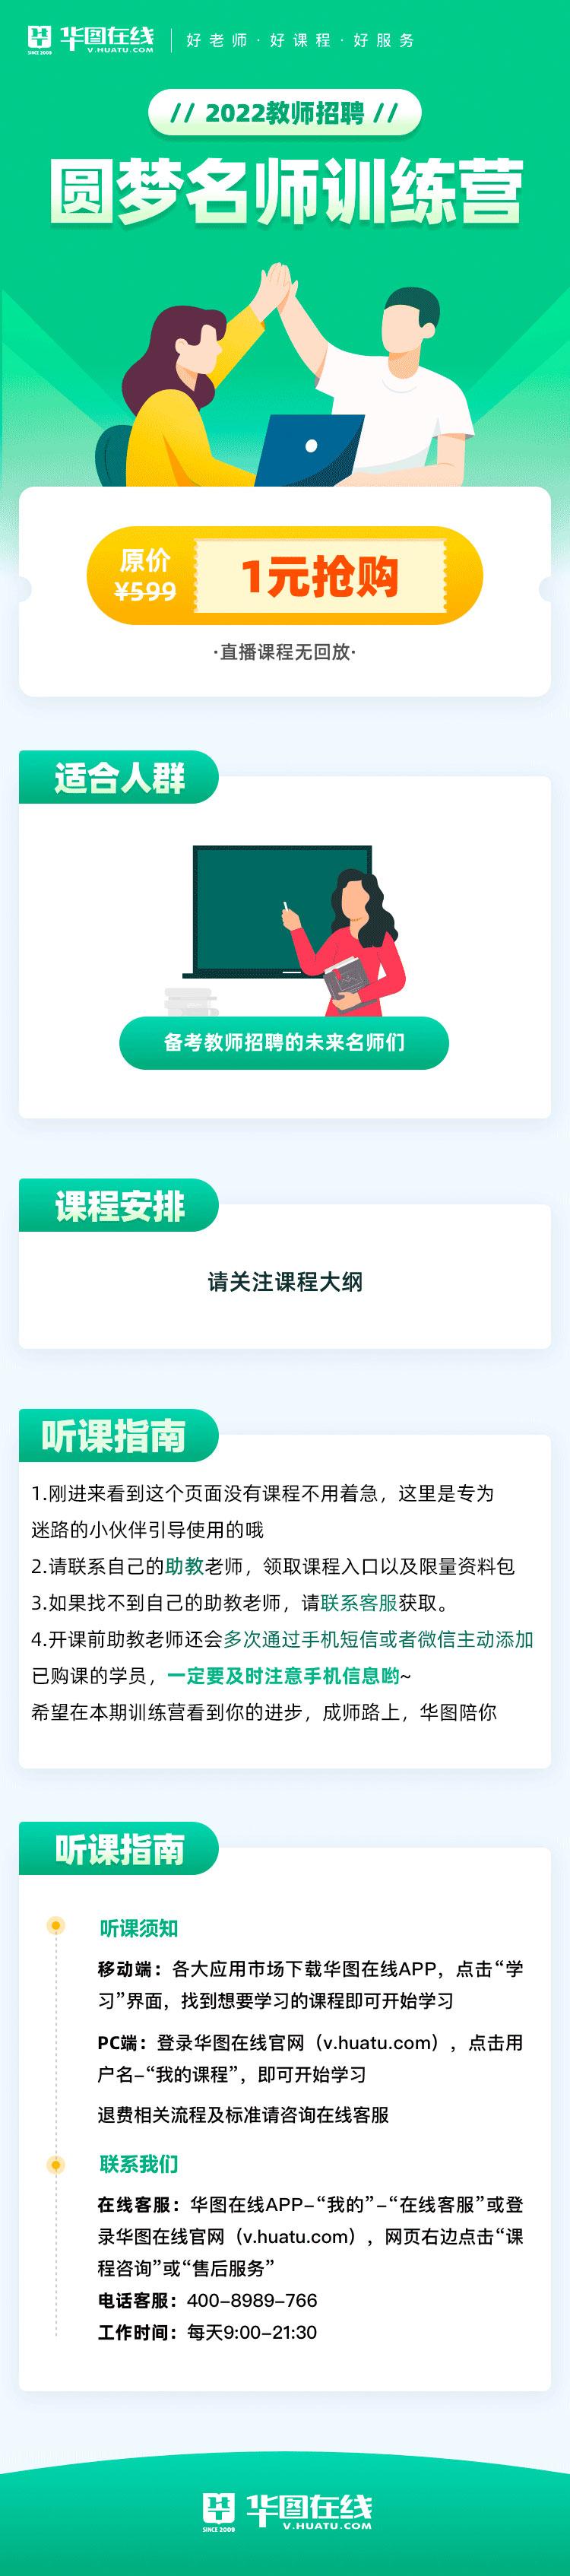 http://upload.htexam.com/userimg/1631166044.jpeg